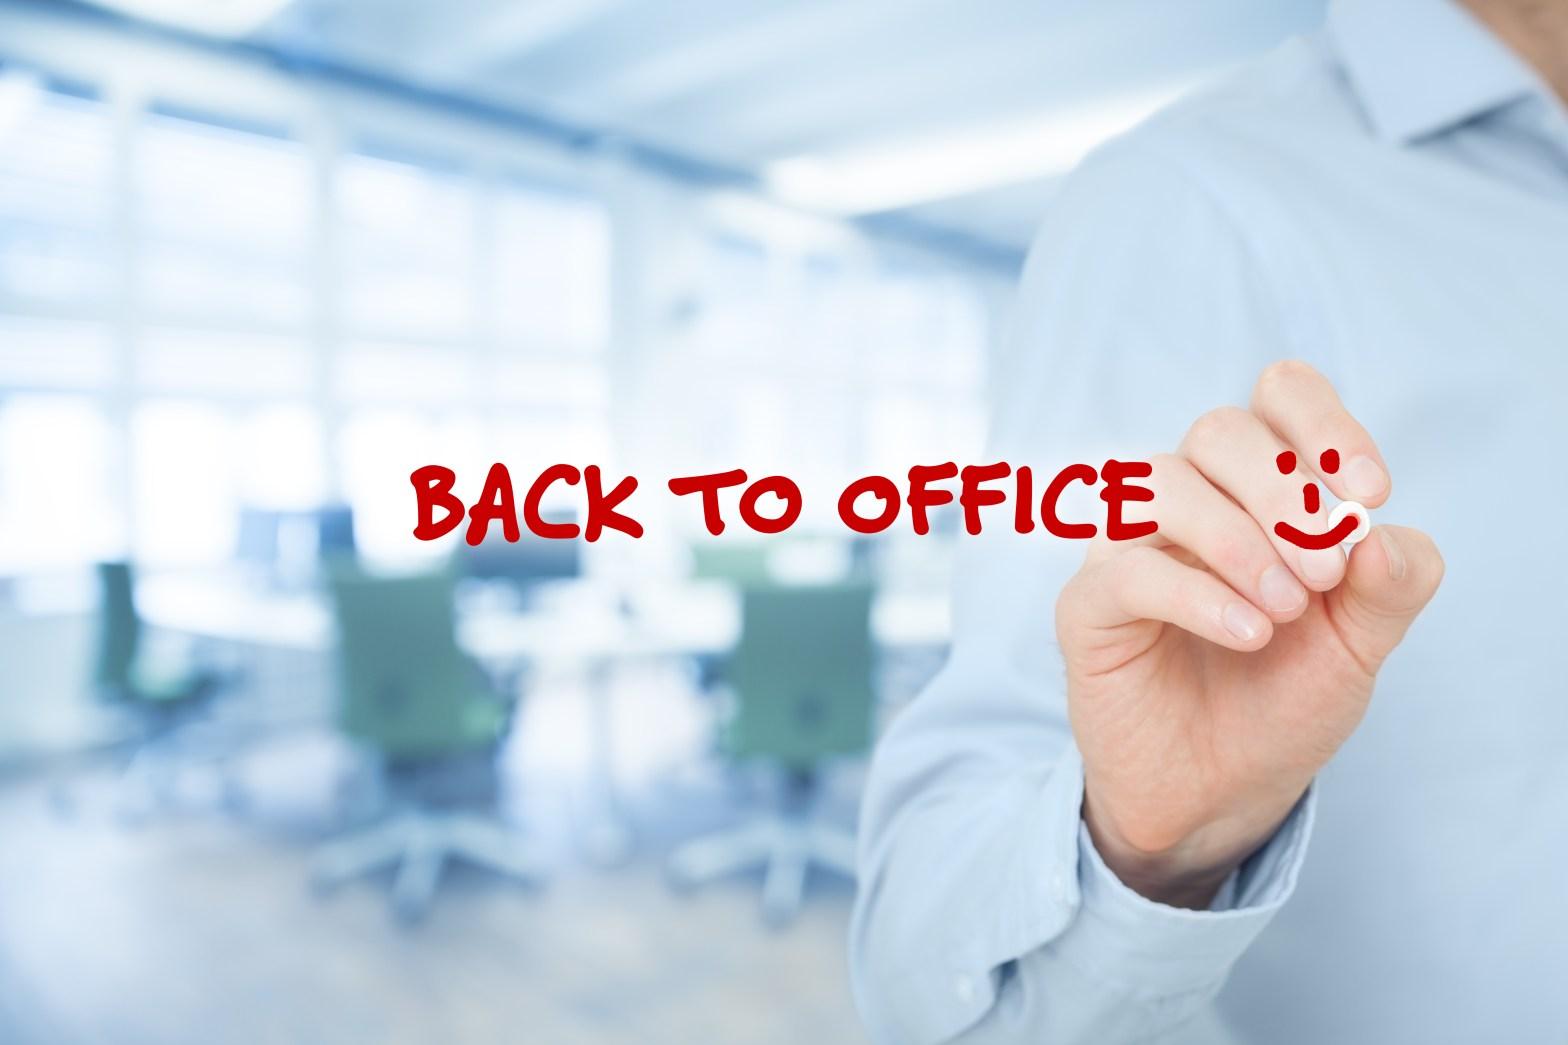 vuelta a la oficina